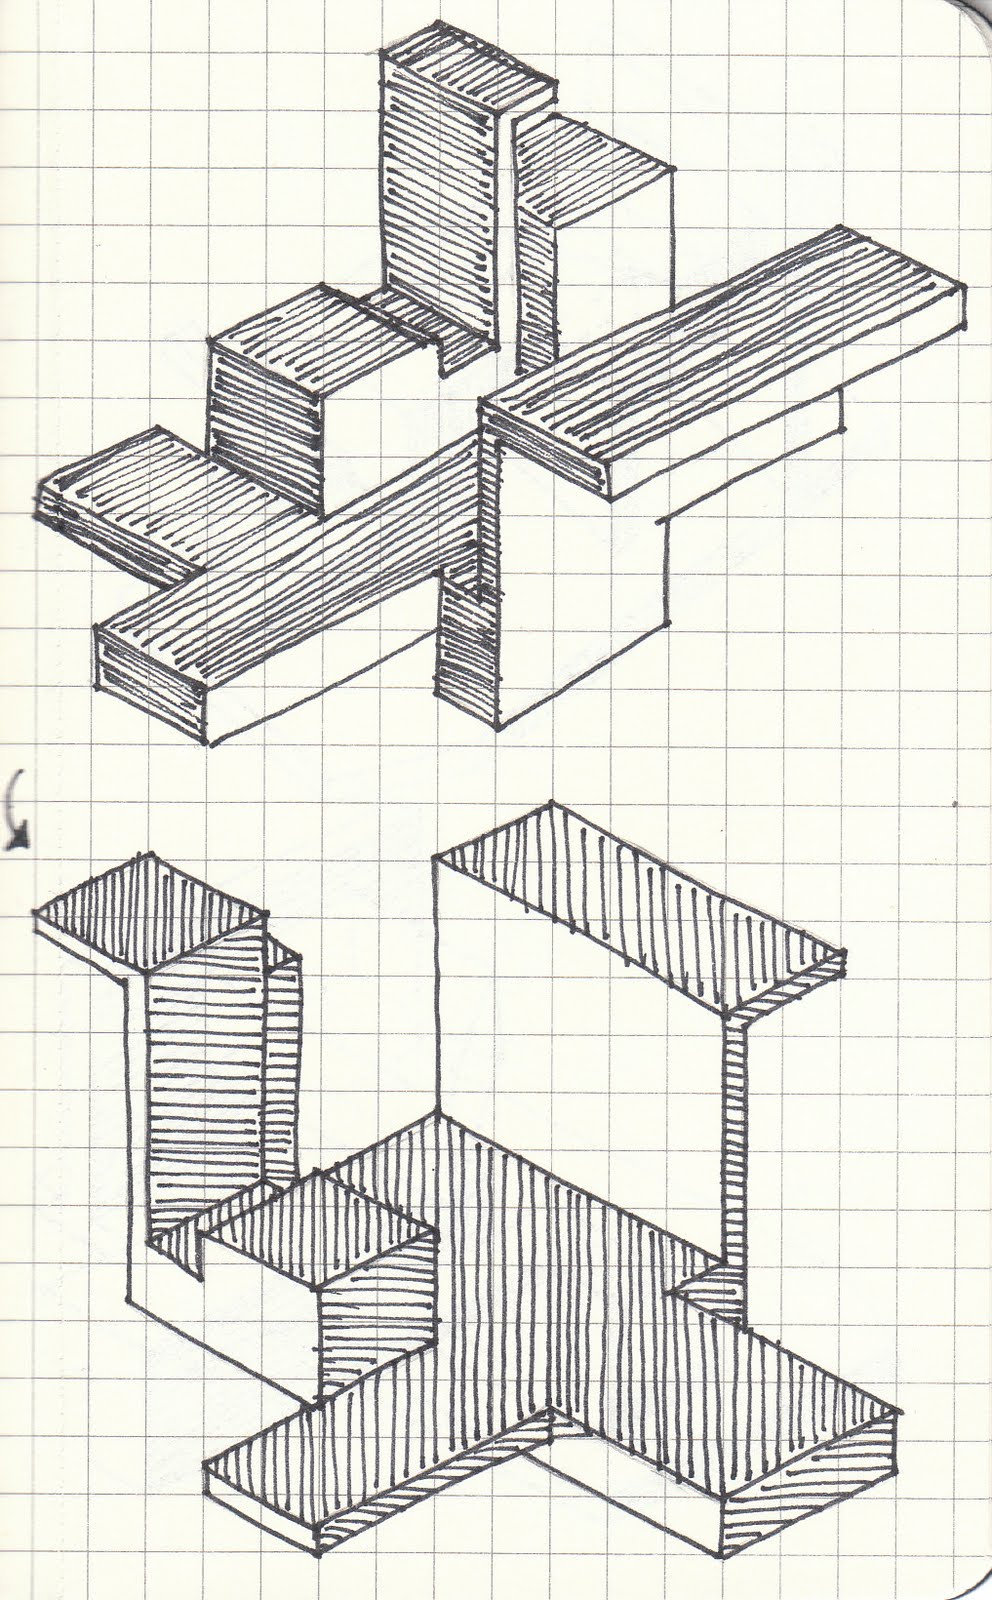 Luen Samonte: ARCH1101 The Space Between Axonometric